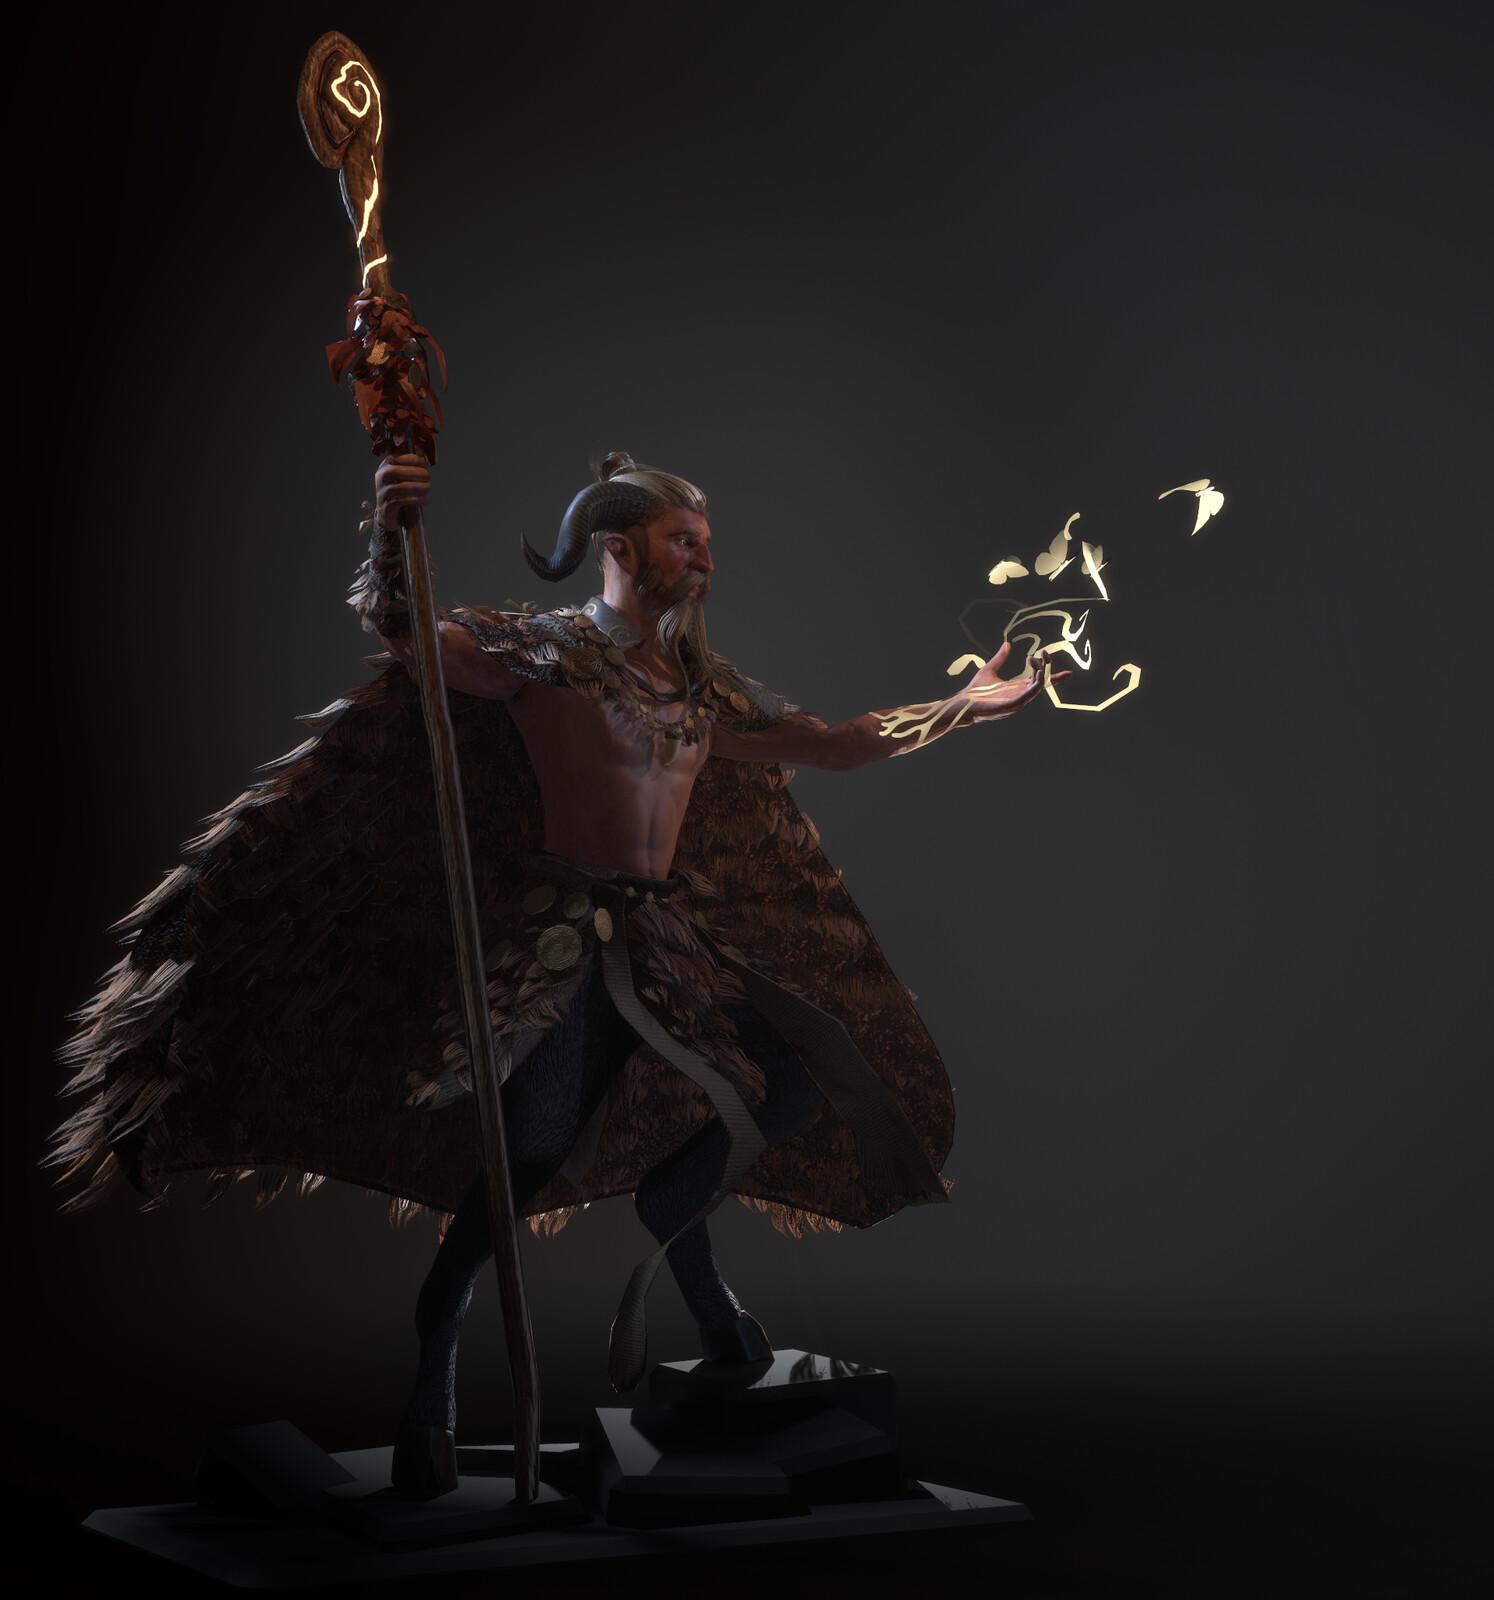 Merlin - The Legend of King Arthur Challenge